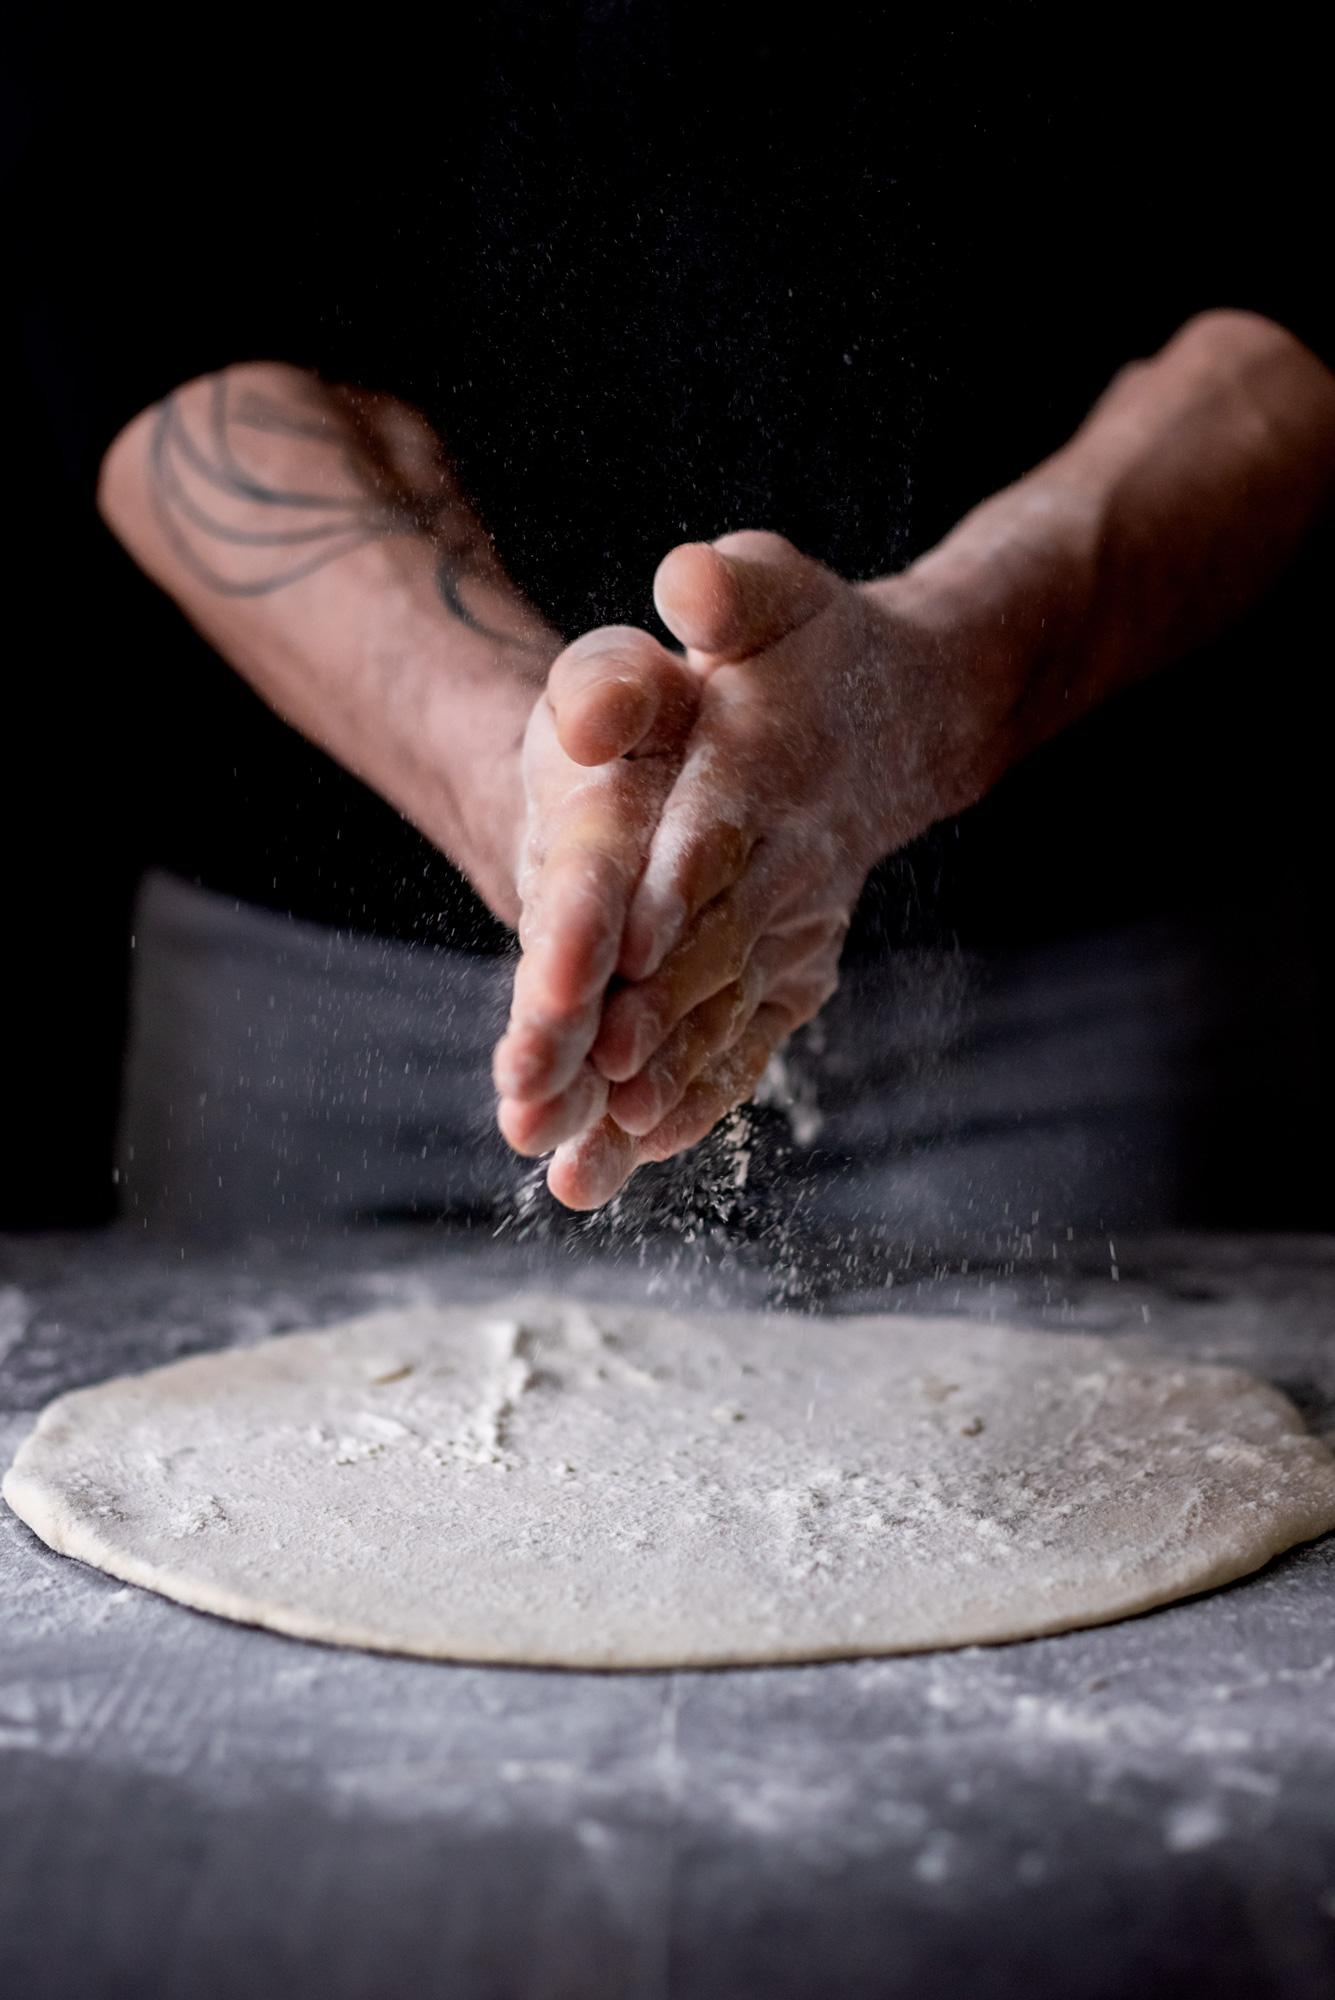 Pate à pain au yaourt ©Emilie Munck Montuclard - Pixellie.fr